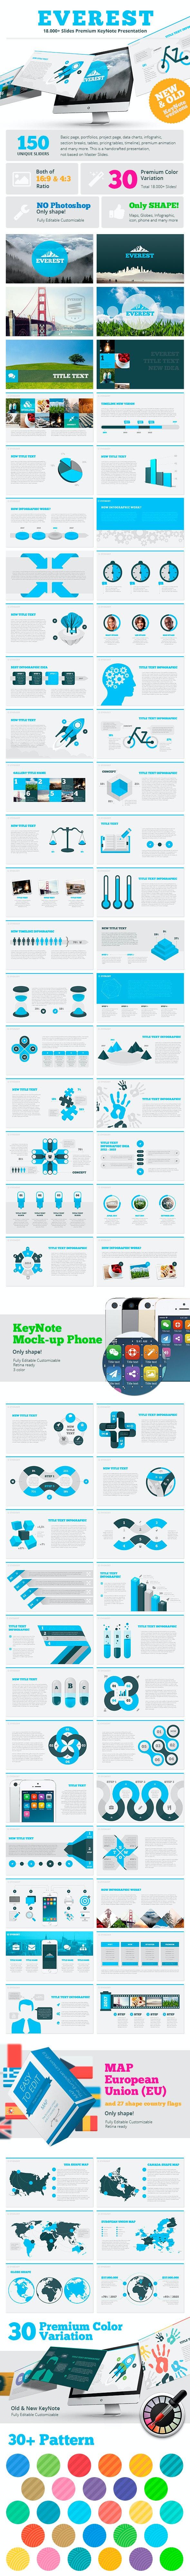 Everest KeyNote - Keynote Templates Presentation Templates